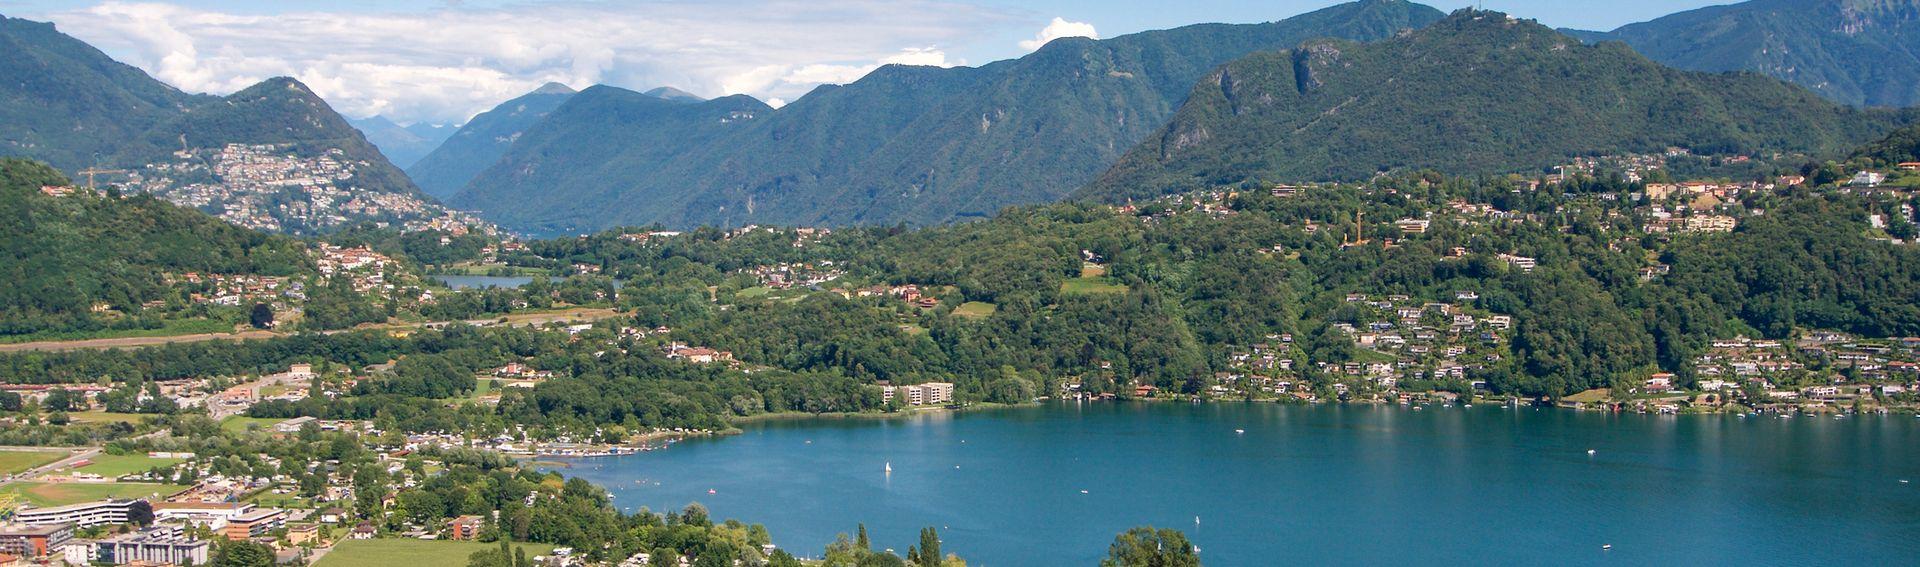 Malcantone (Caslano, Ponte Tresa)